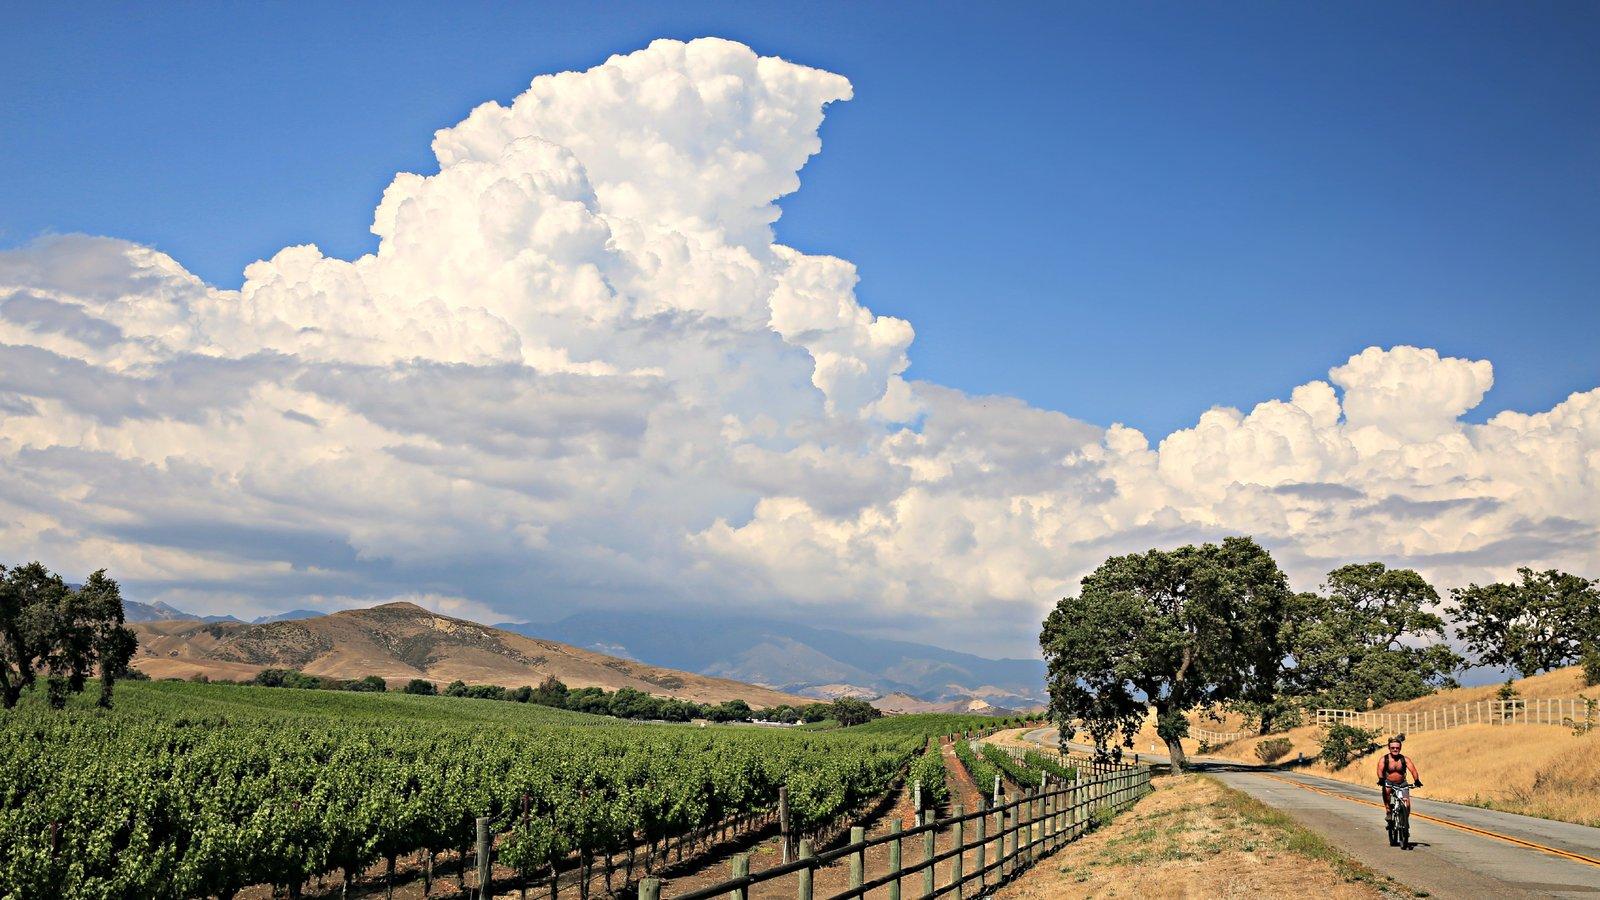 Santa Ynez Valley caracterizando cenas tranquilas e fazenda